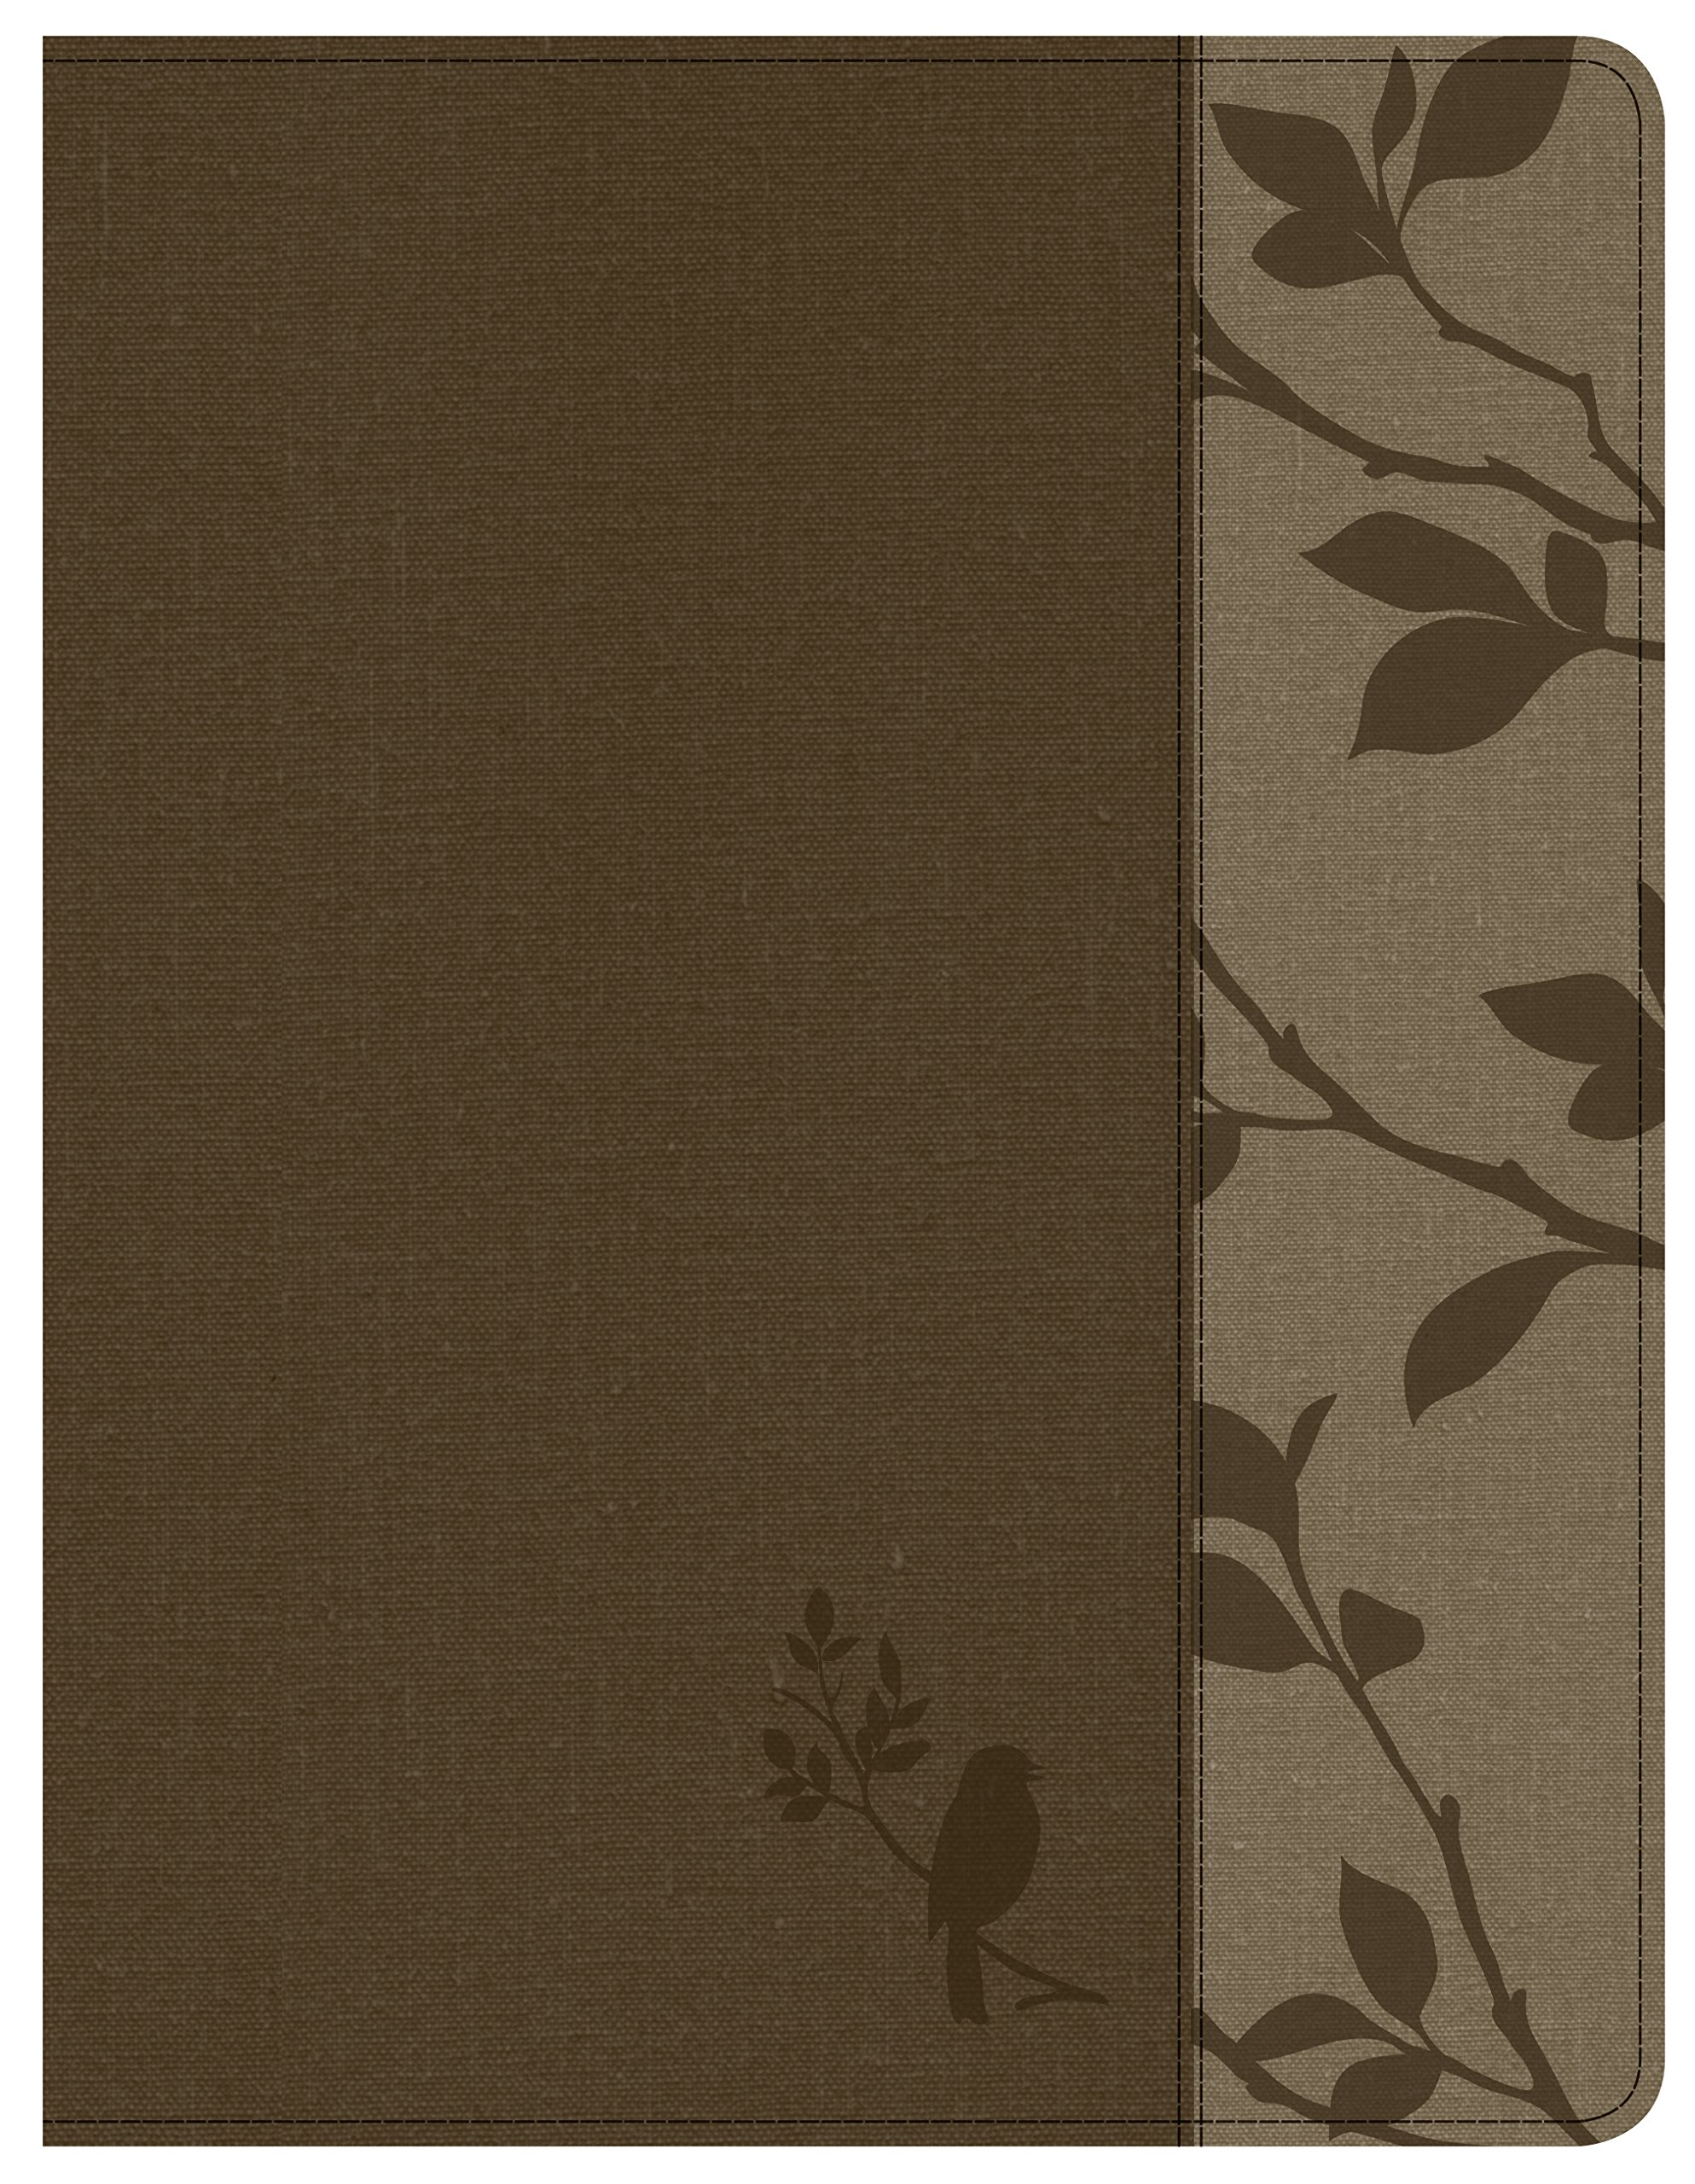 The Illustrator's Notetaking Bible: NKJV Edition, Hickory